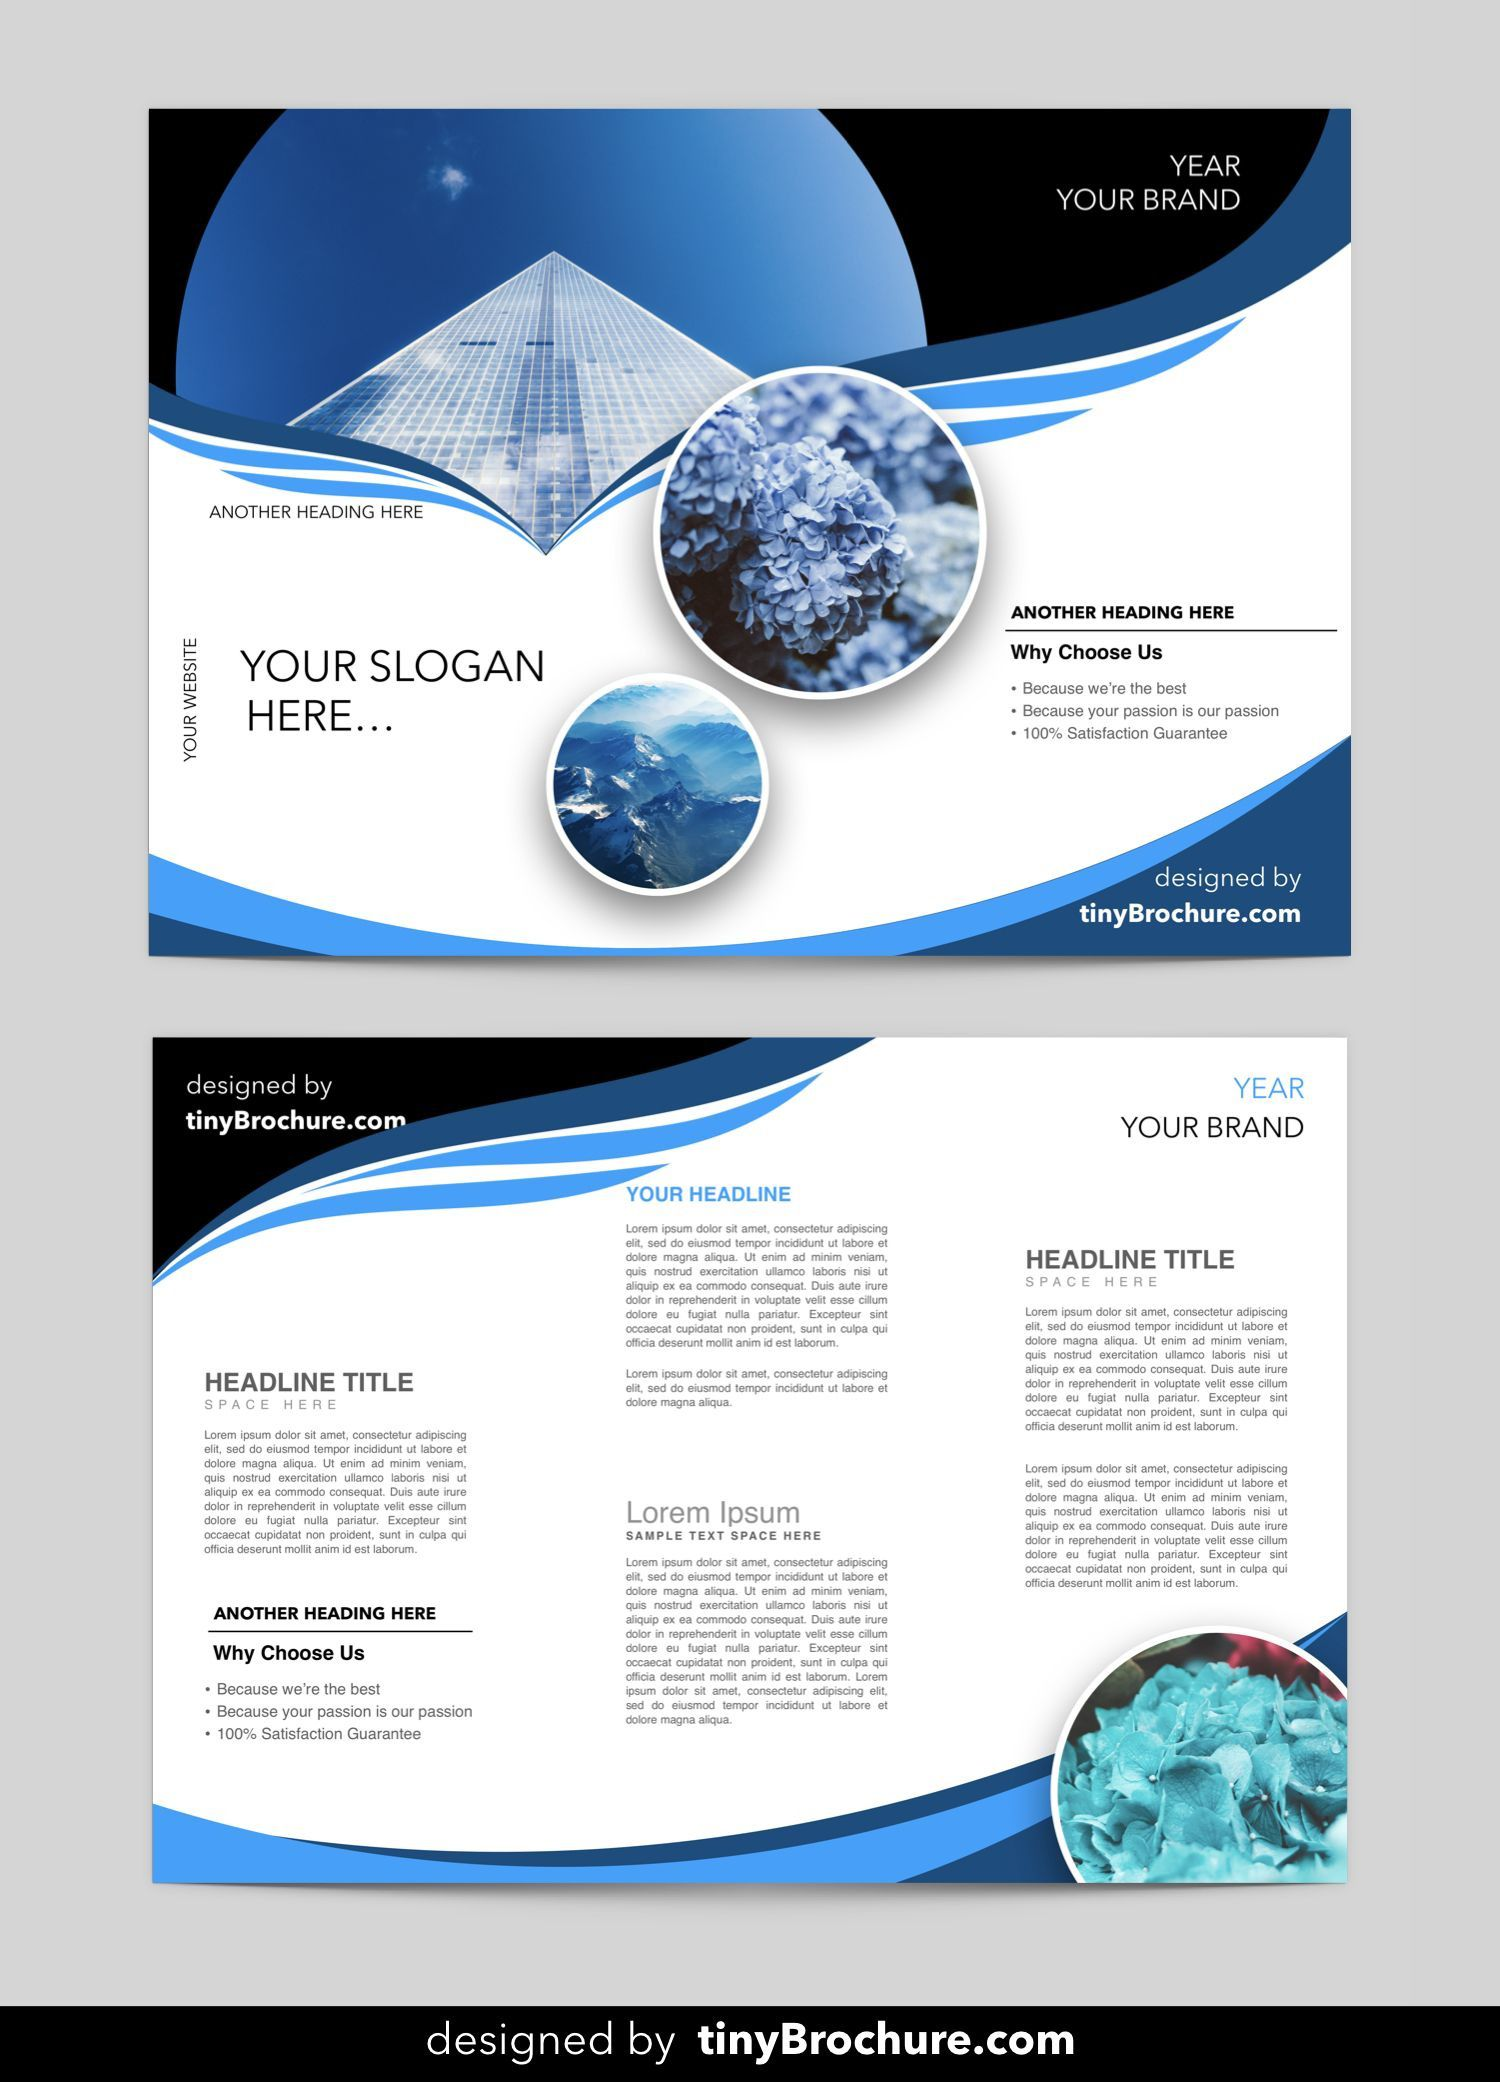 000 Formidable Brochure Layout M Word Sample  Microsoft Funeral TemplateFull